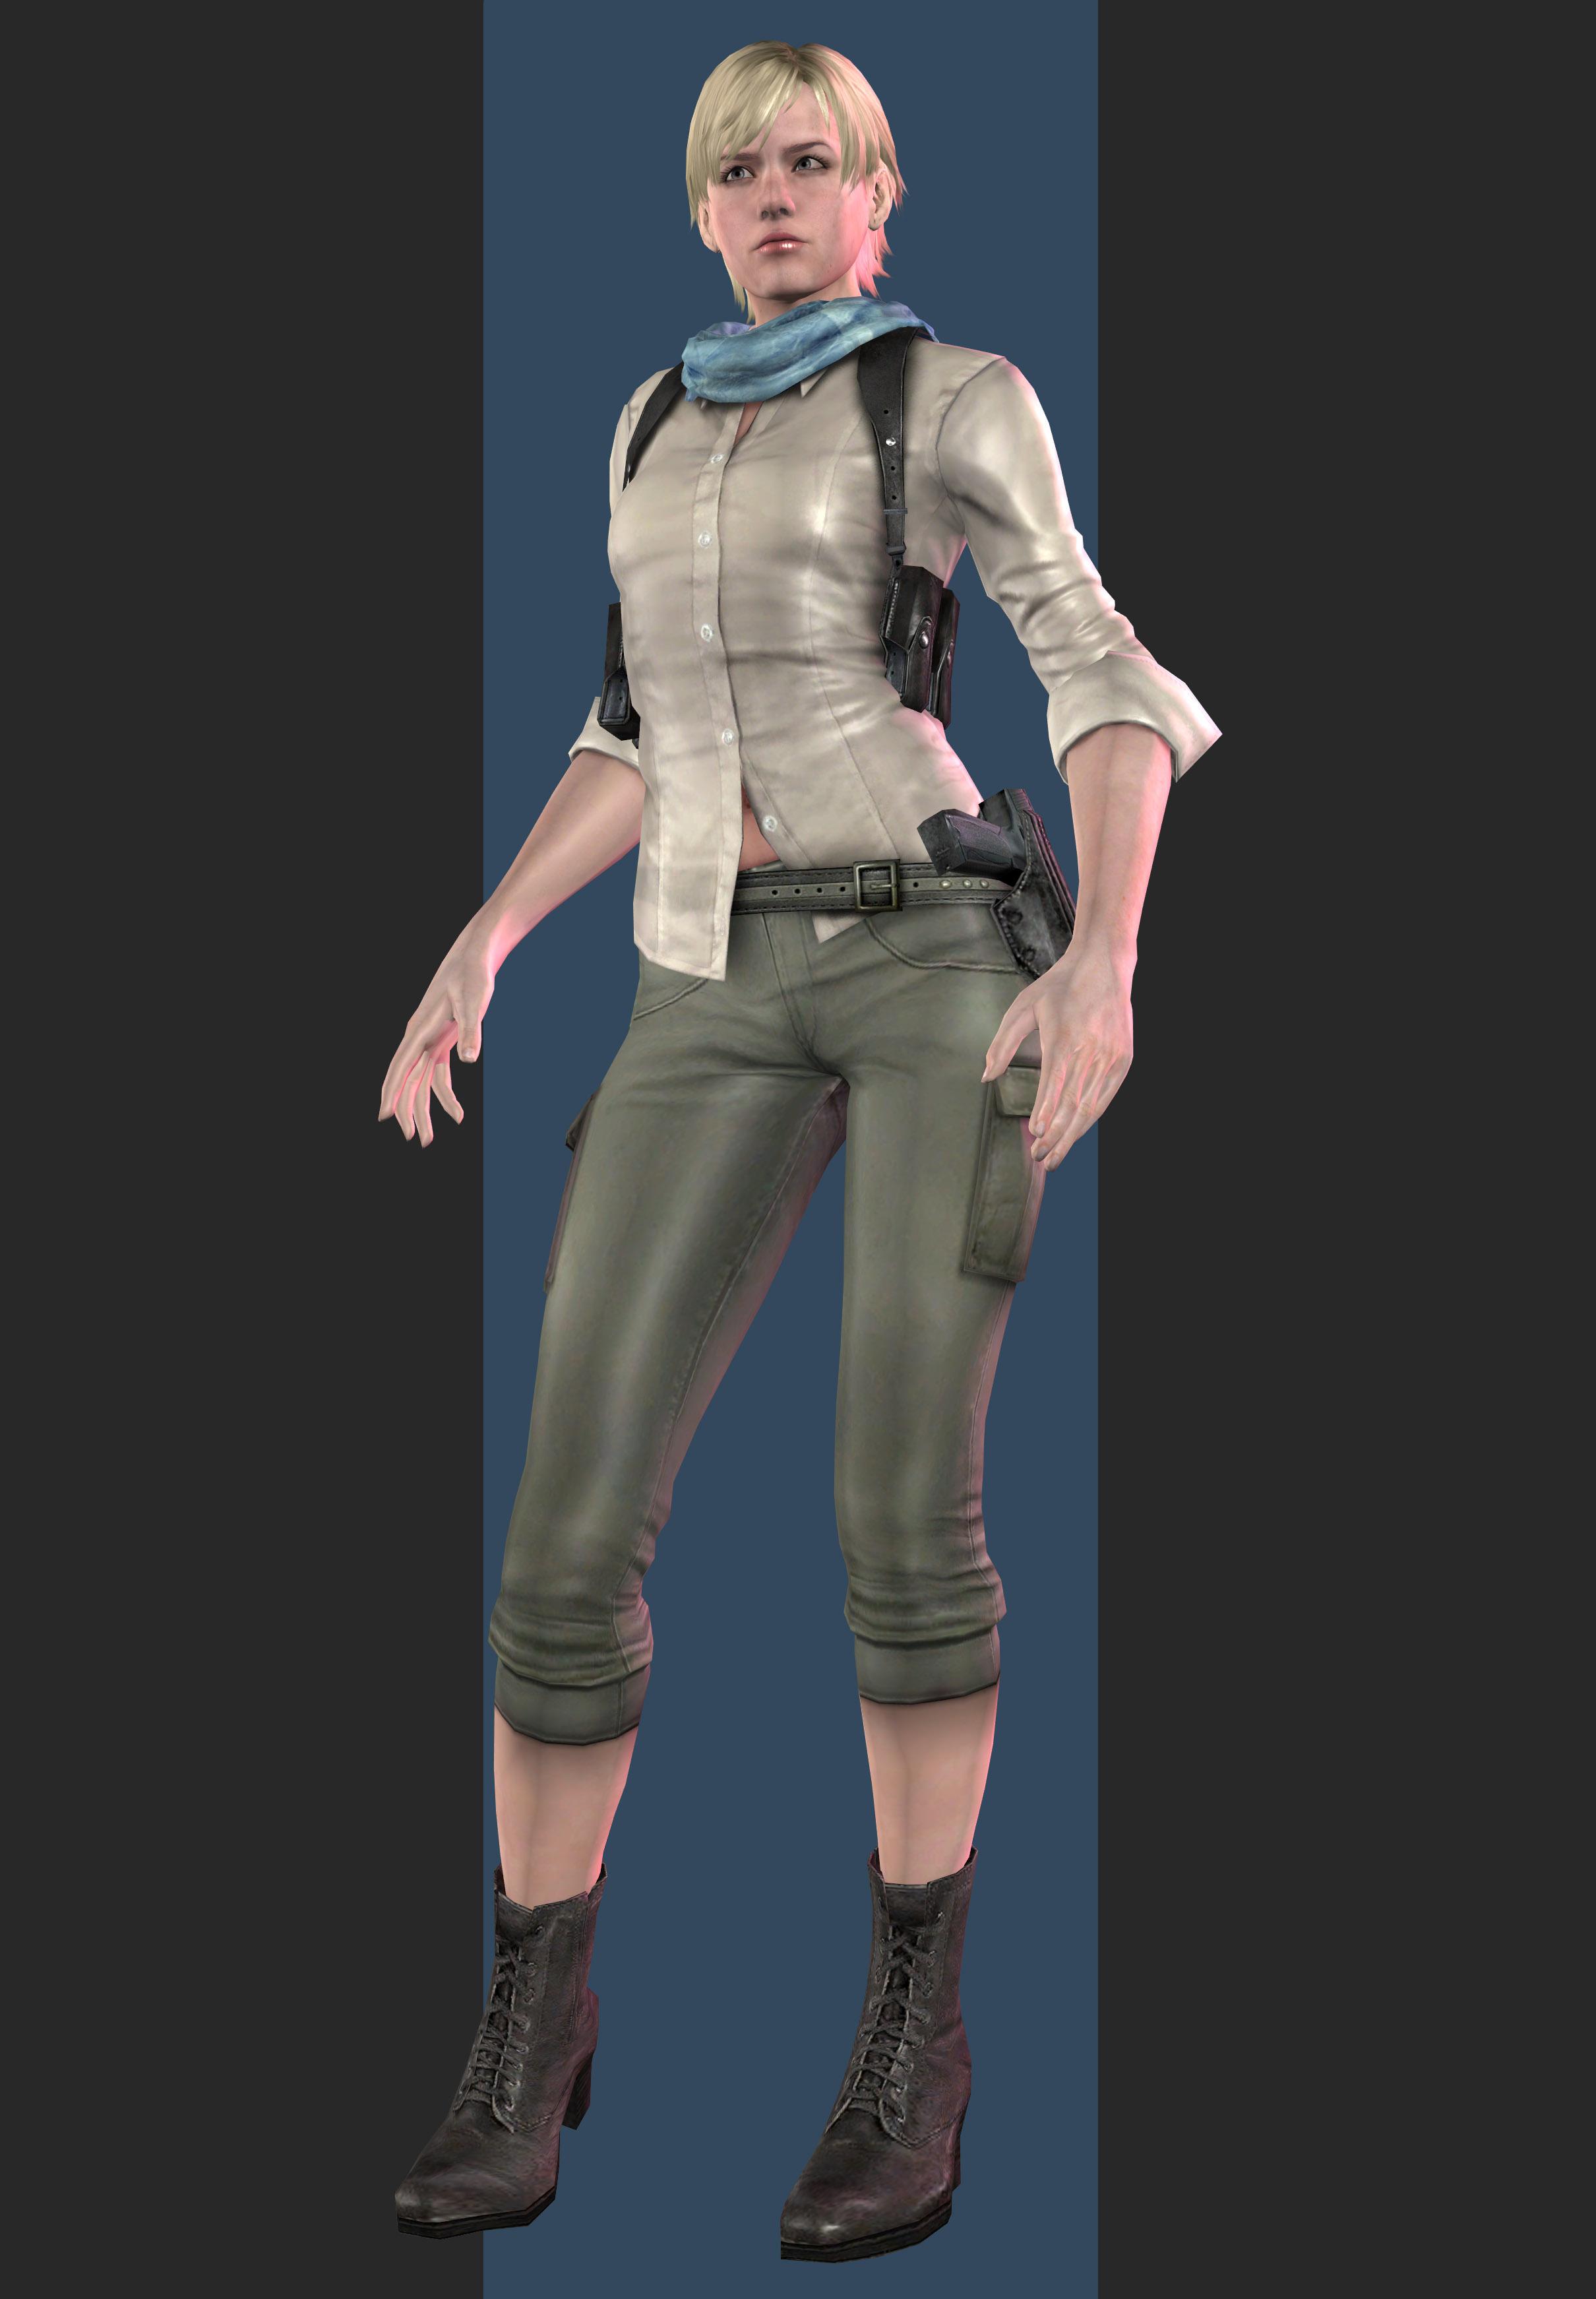 GTA-SA-Modificaciones: Skin Sherry Birkin Fairy mod GTA SA